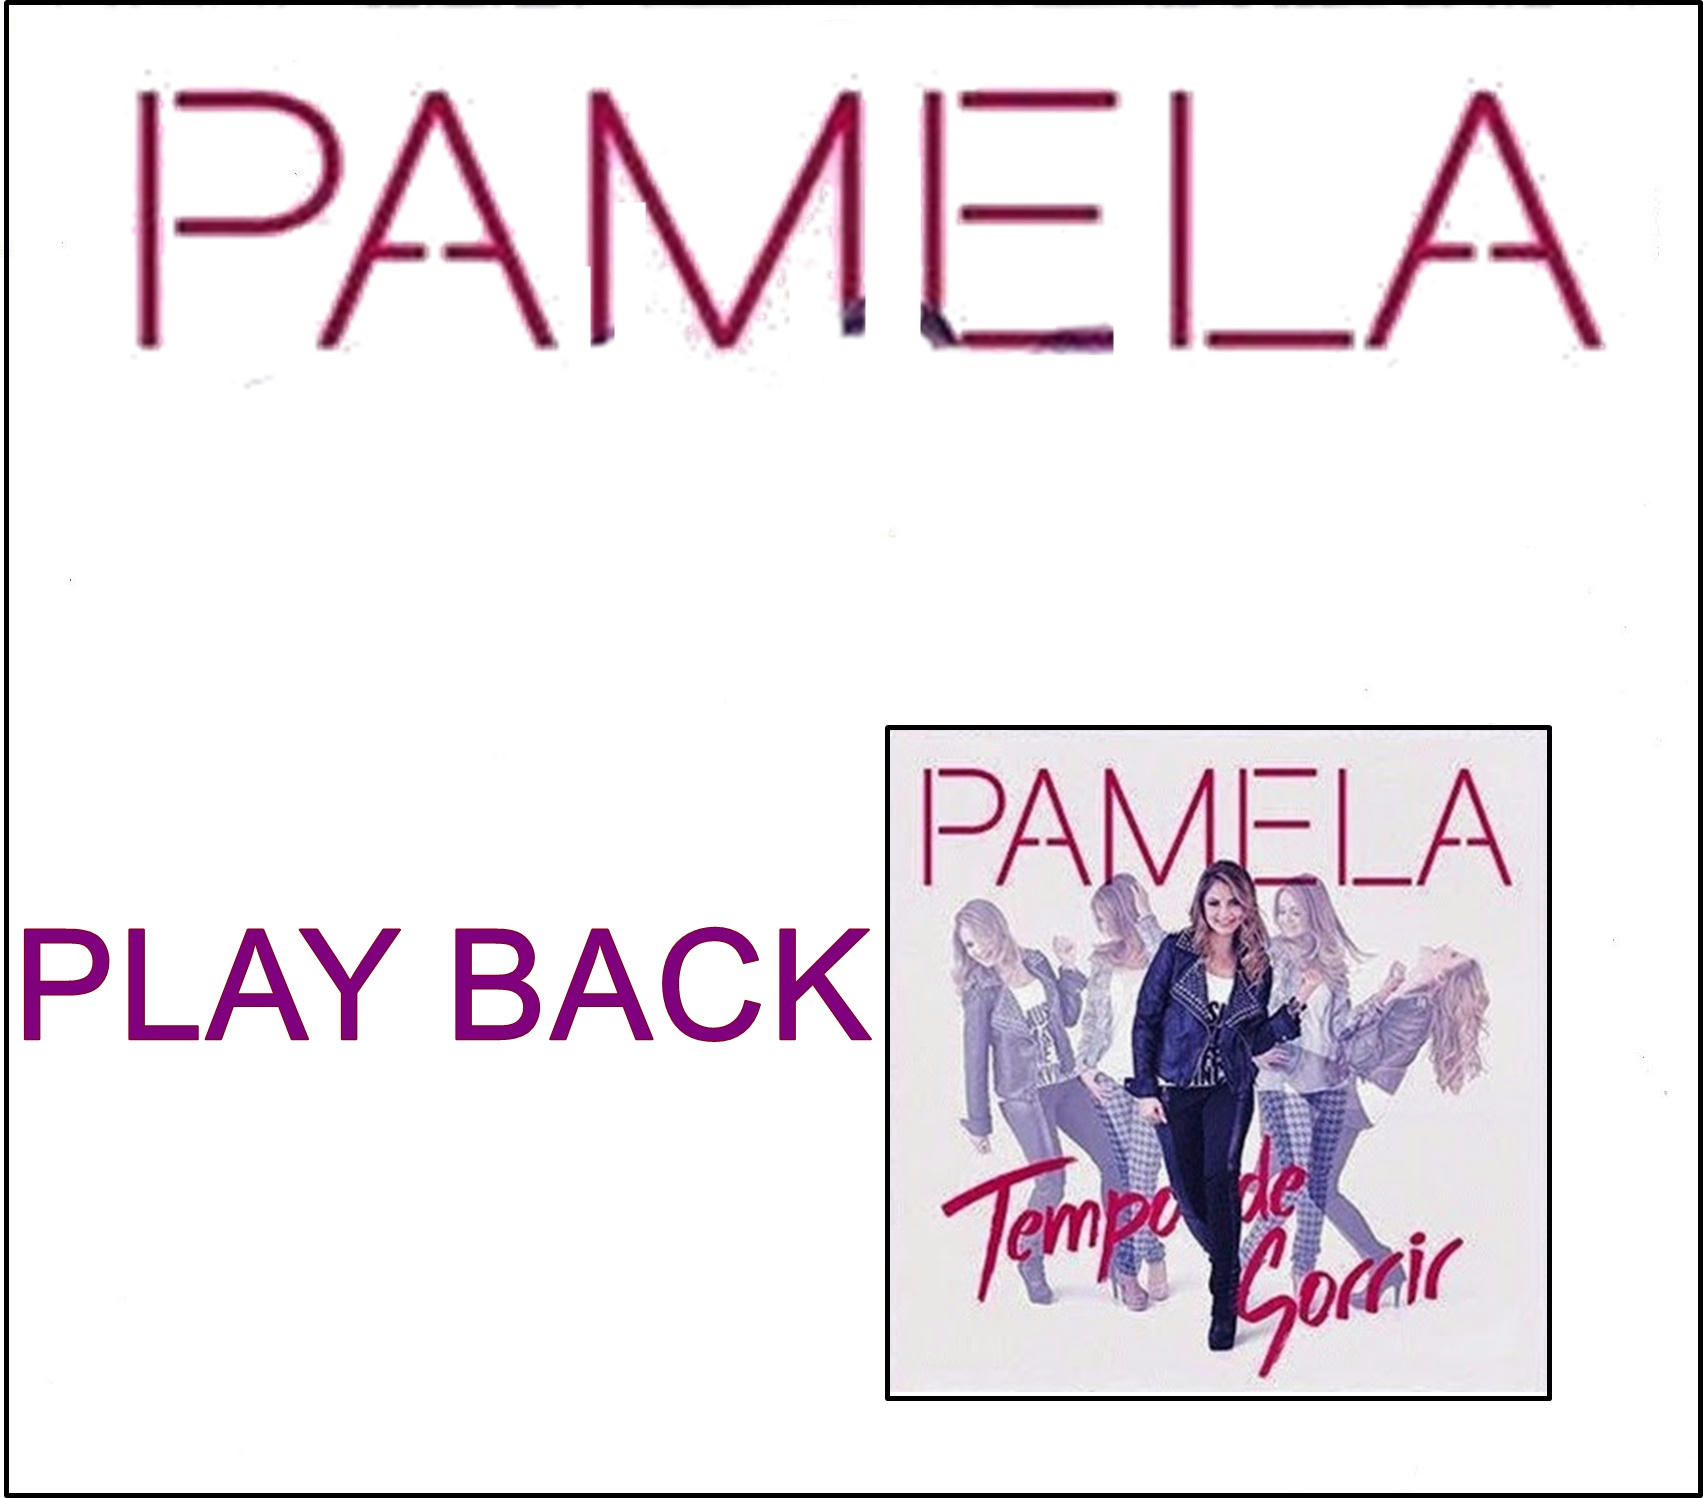 Pamela - Tempo de Sorrir - Playback 2014